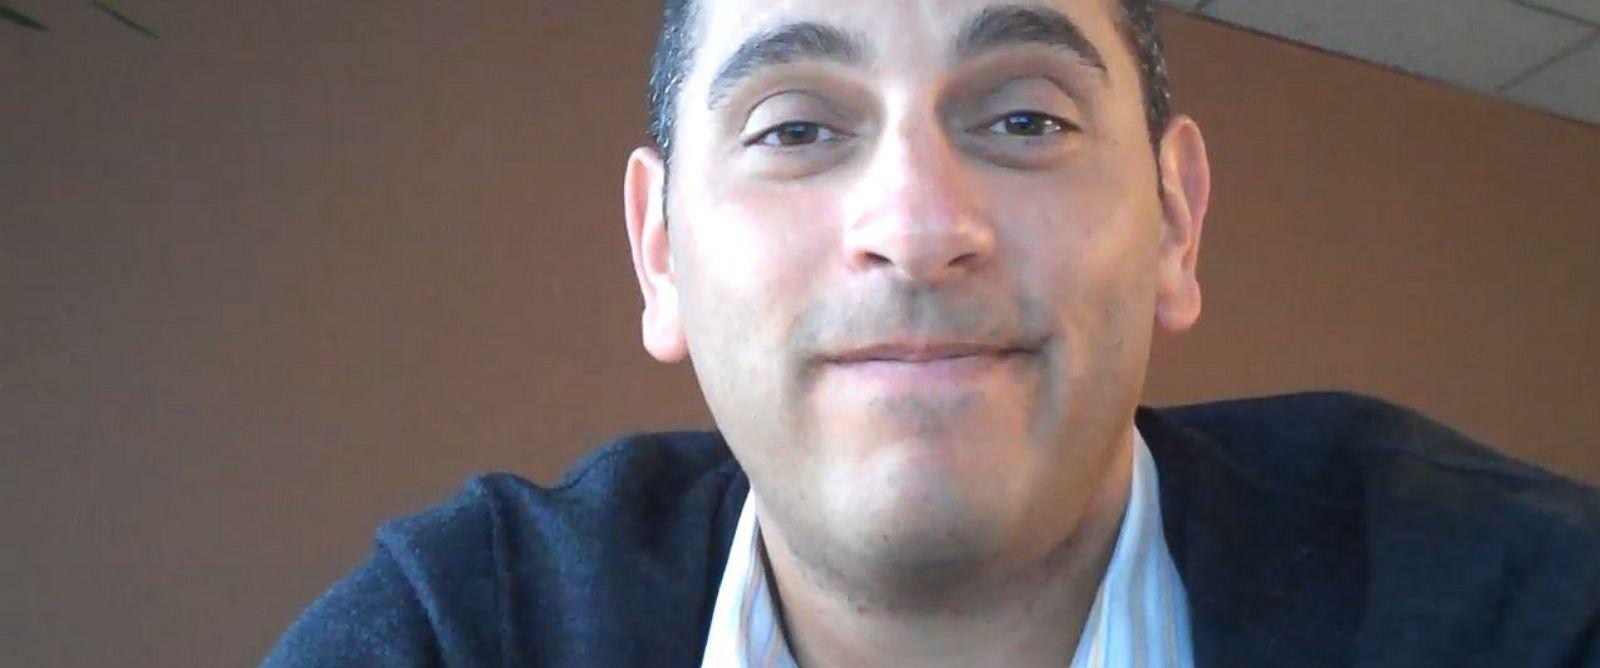 PHOTO: KeepTree founder Jon Loew.